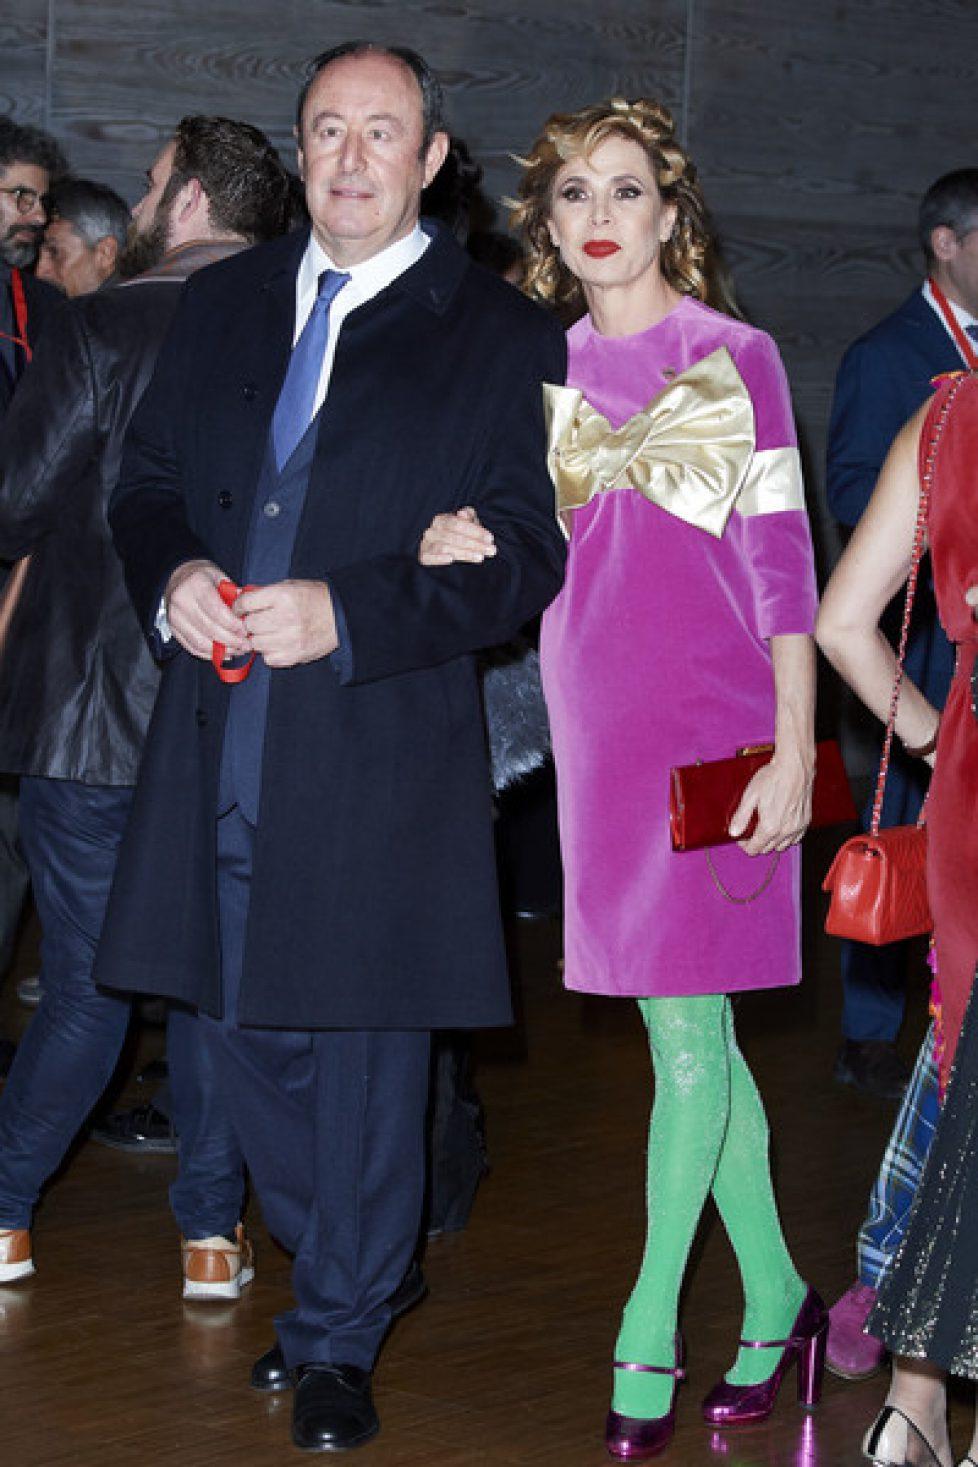 Queen+Letizia+Spain+Attends+National+Fashion+QxHGZhcdtv7l